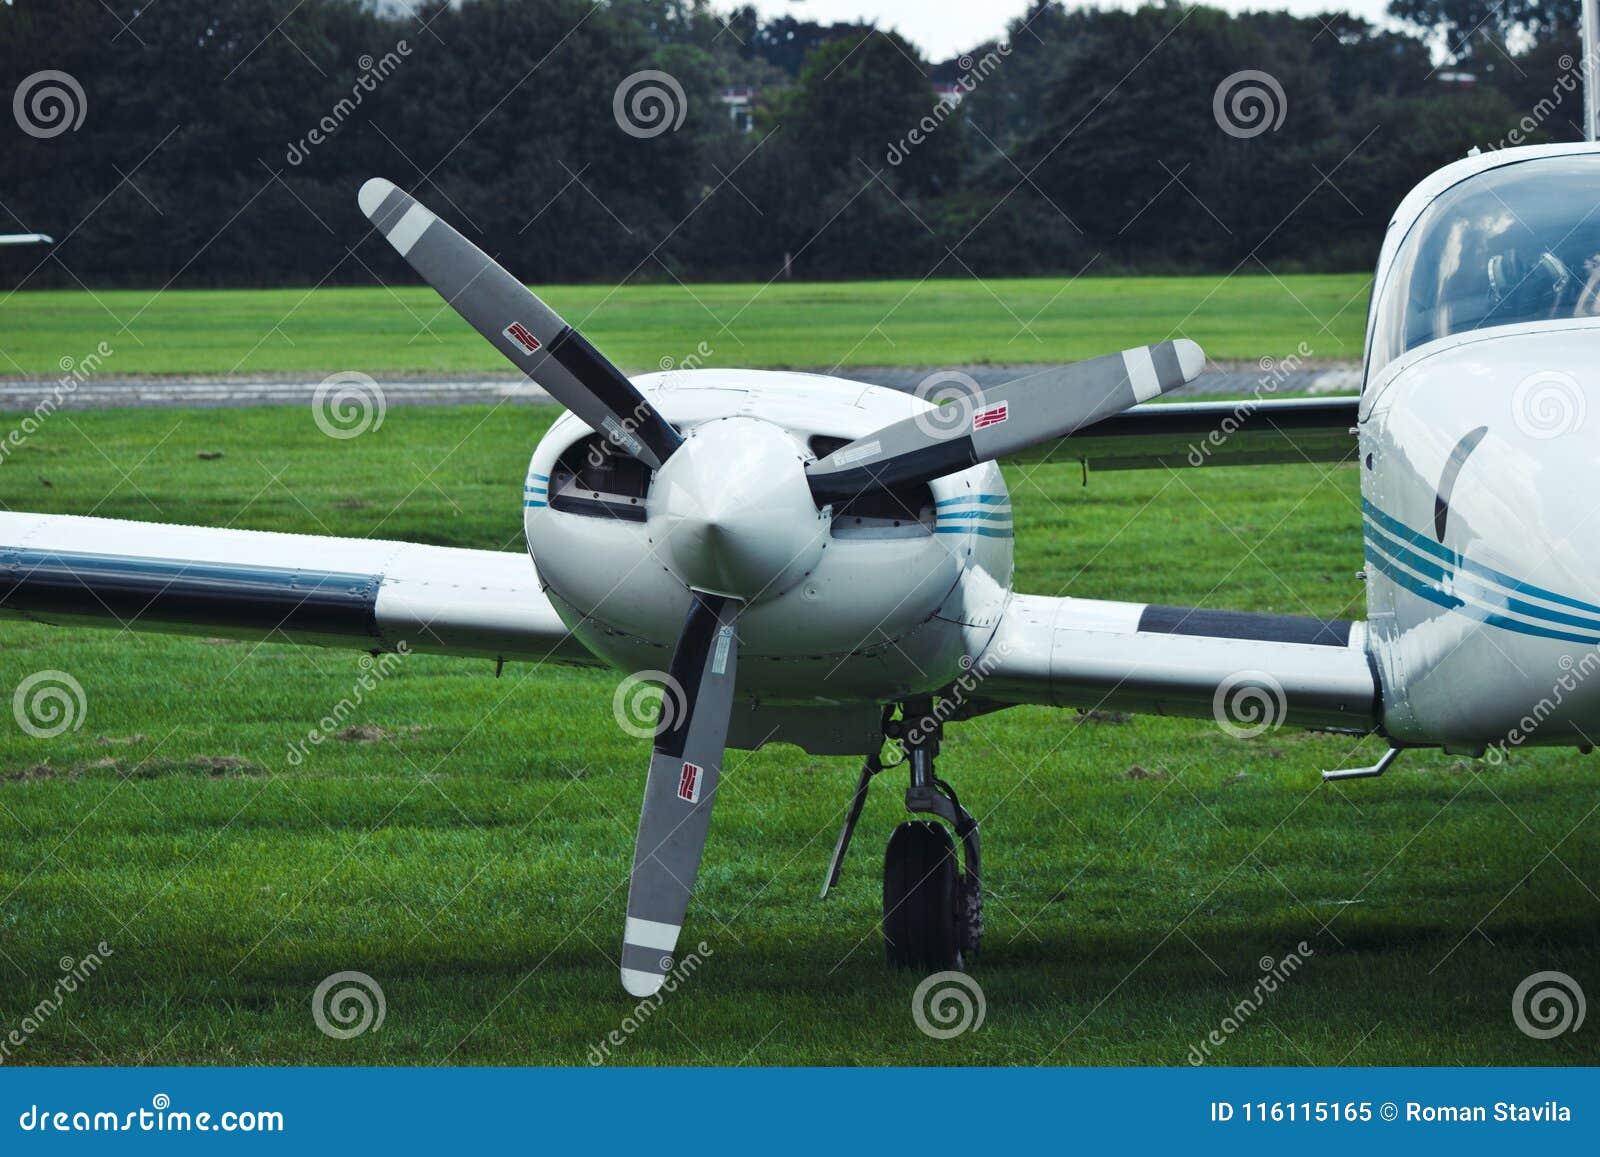 Airplane propeller. engine aircraft. airplane.